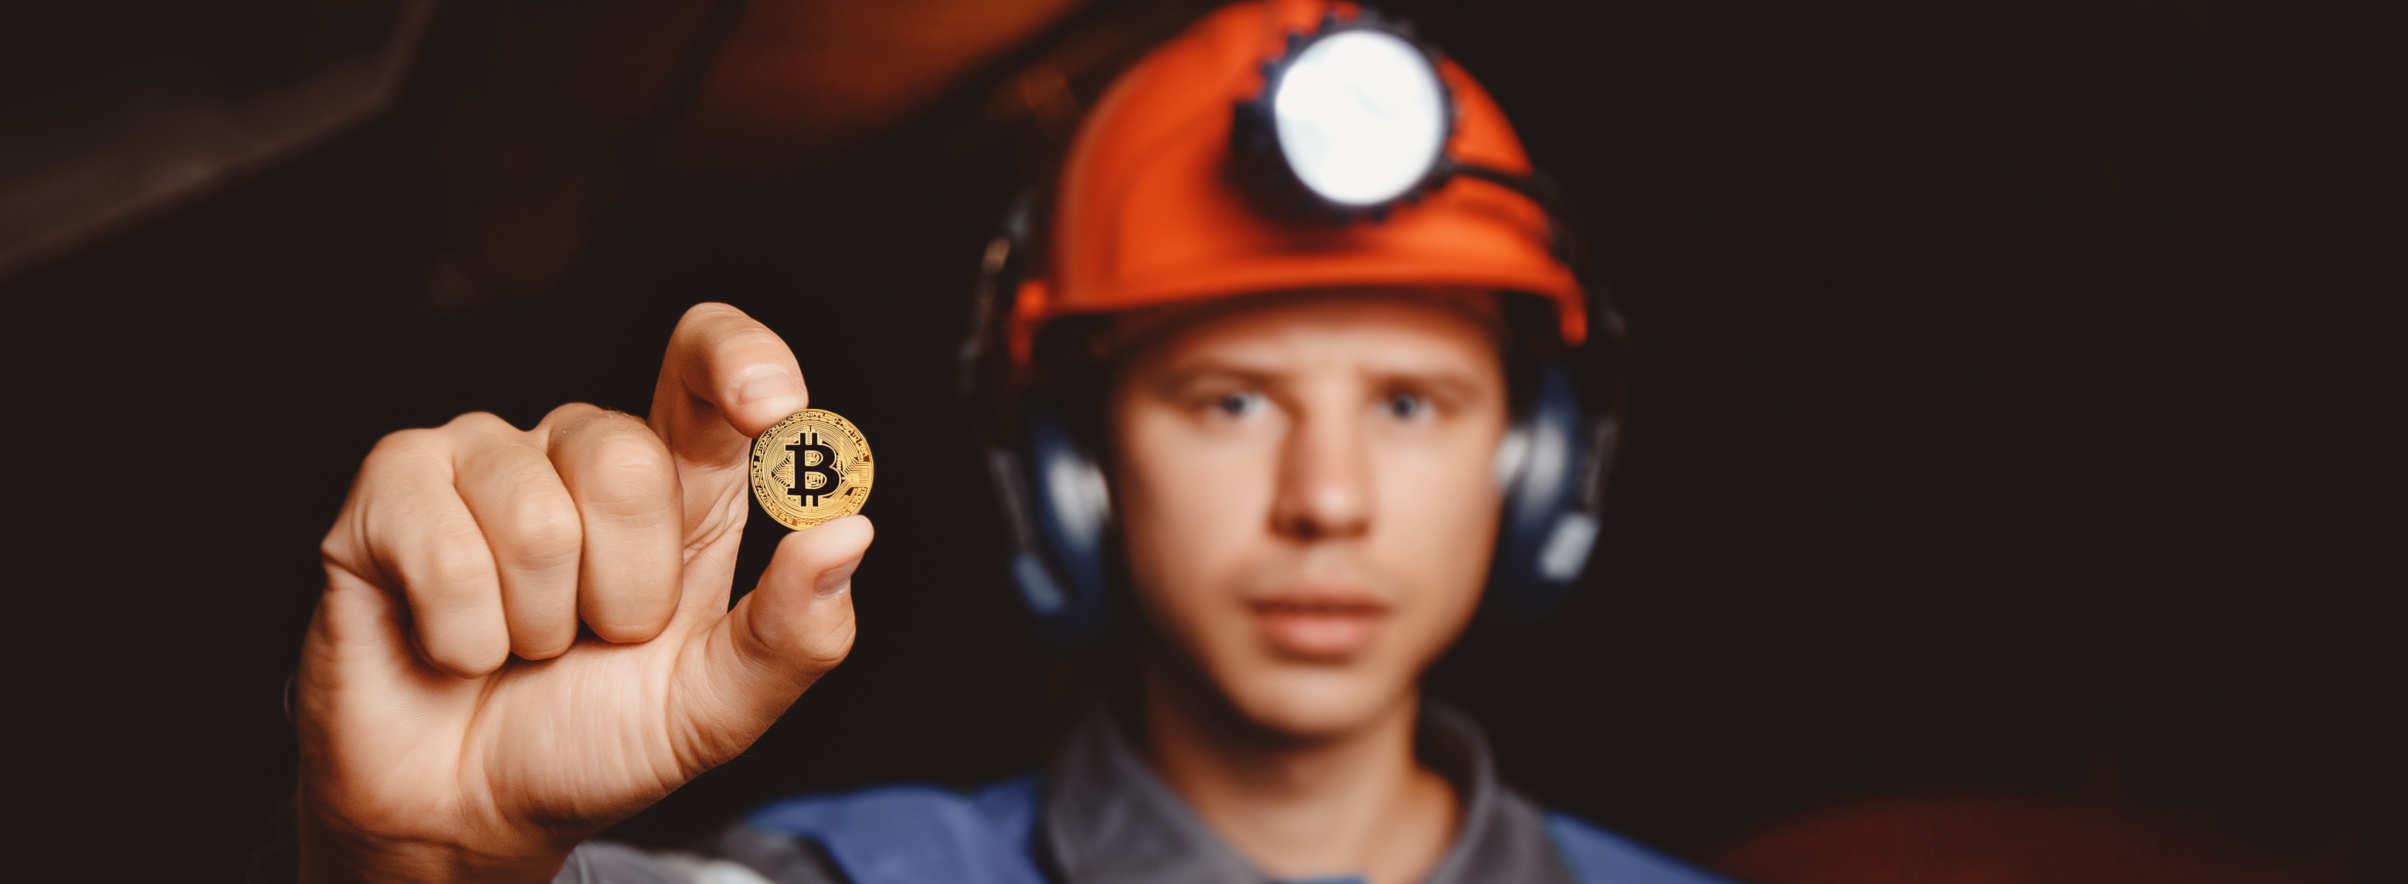 minerar bitcoin minerador de bitcoin